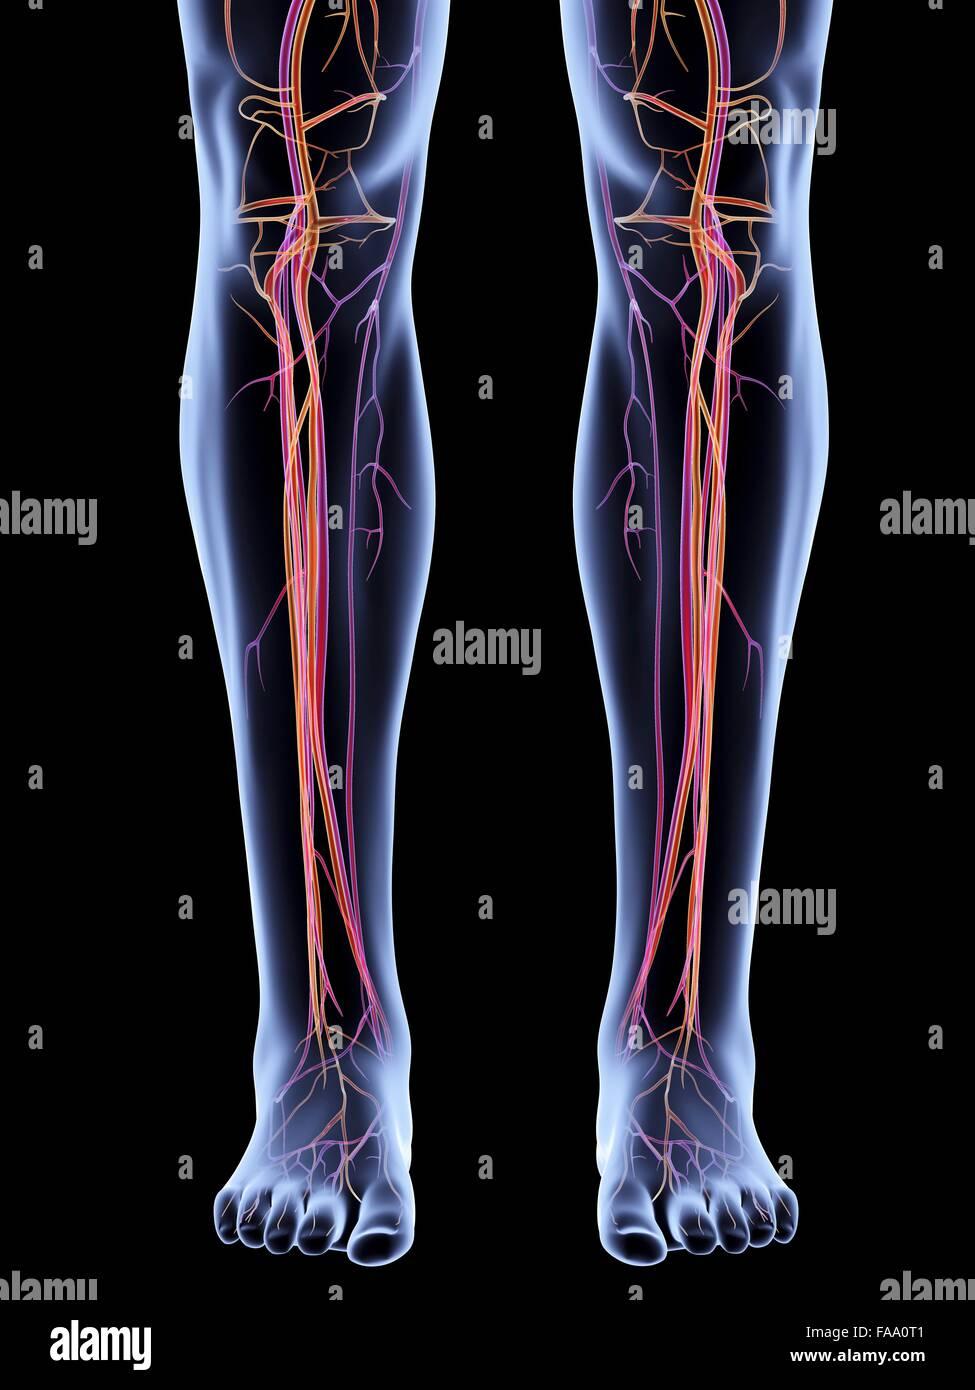 Artery Legs Imágenes De Stock & Artery Legs Fotos De Stock - Alamy